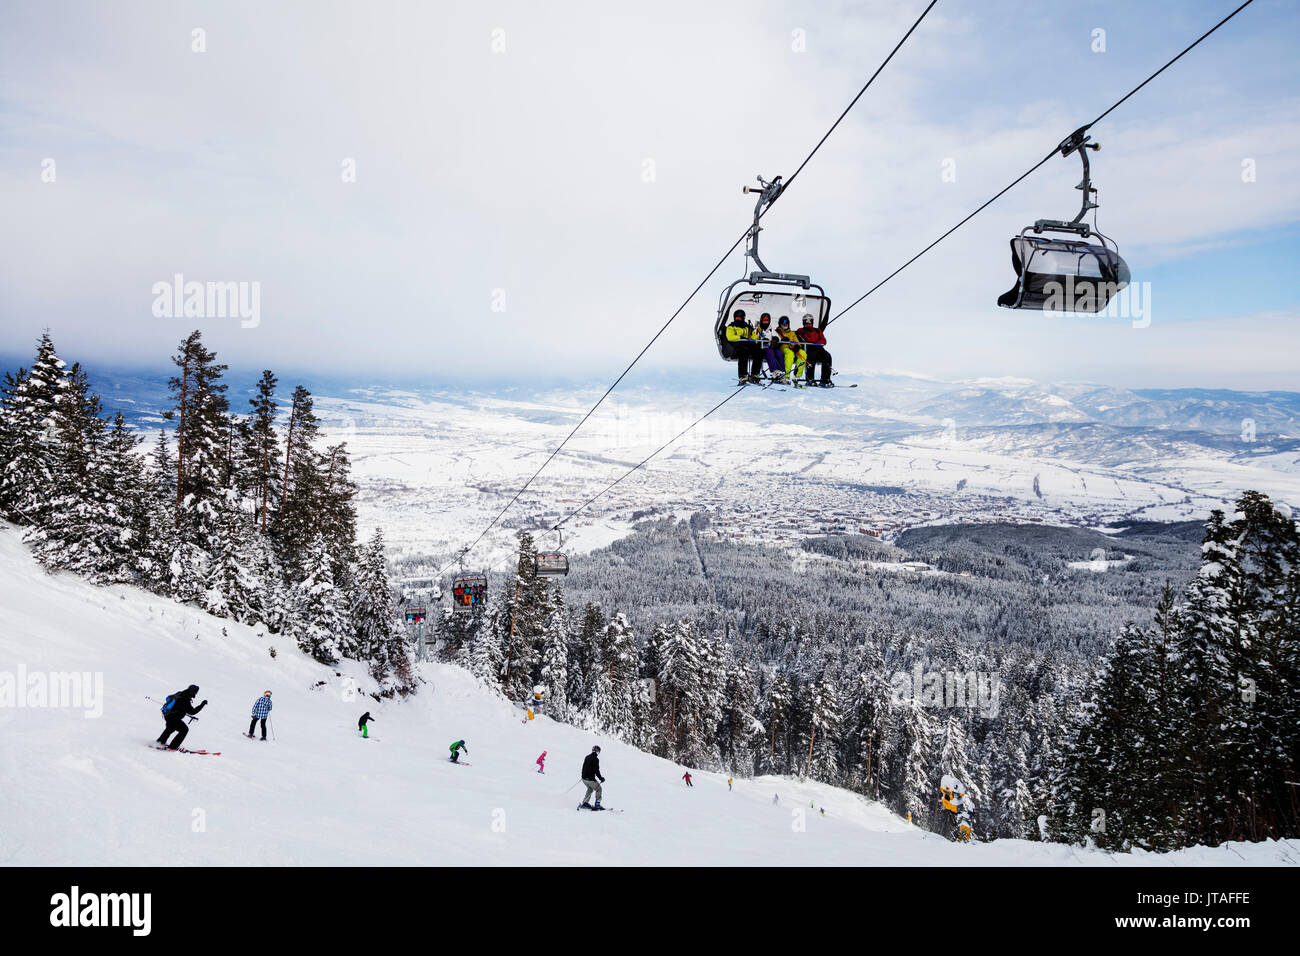 Piste per sciatori, Bansko resort, Bulgaria, Europa Immagini Stock